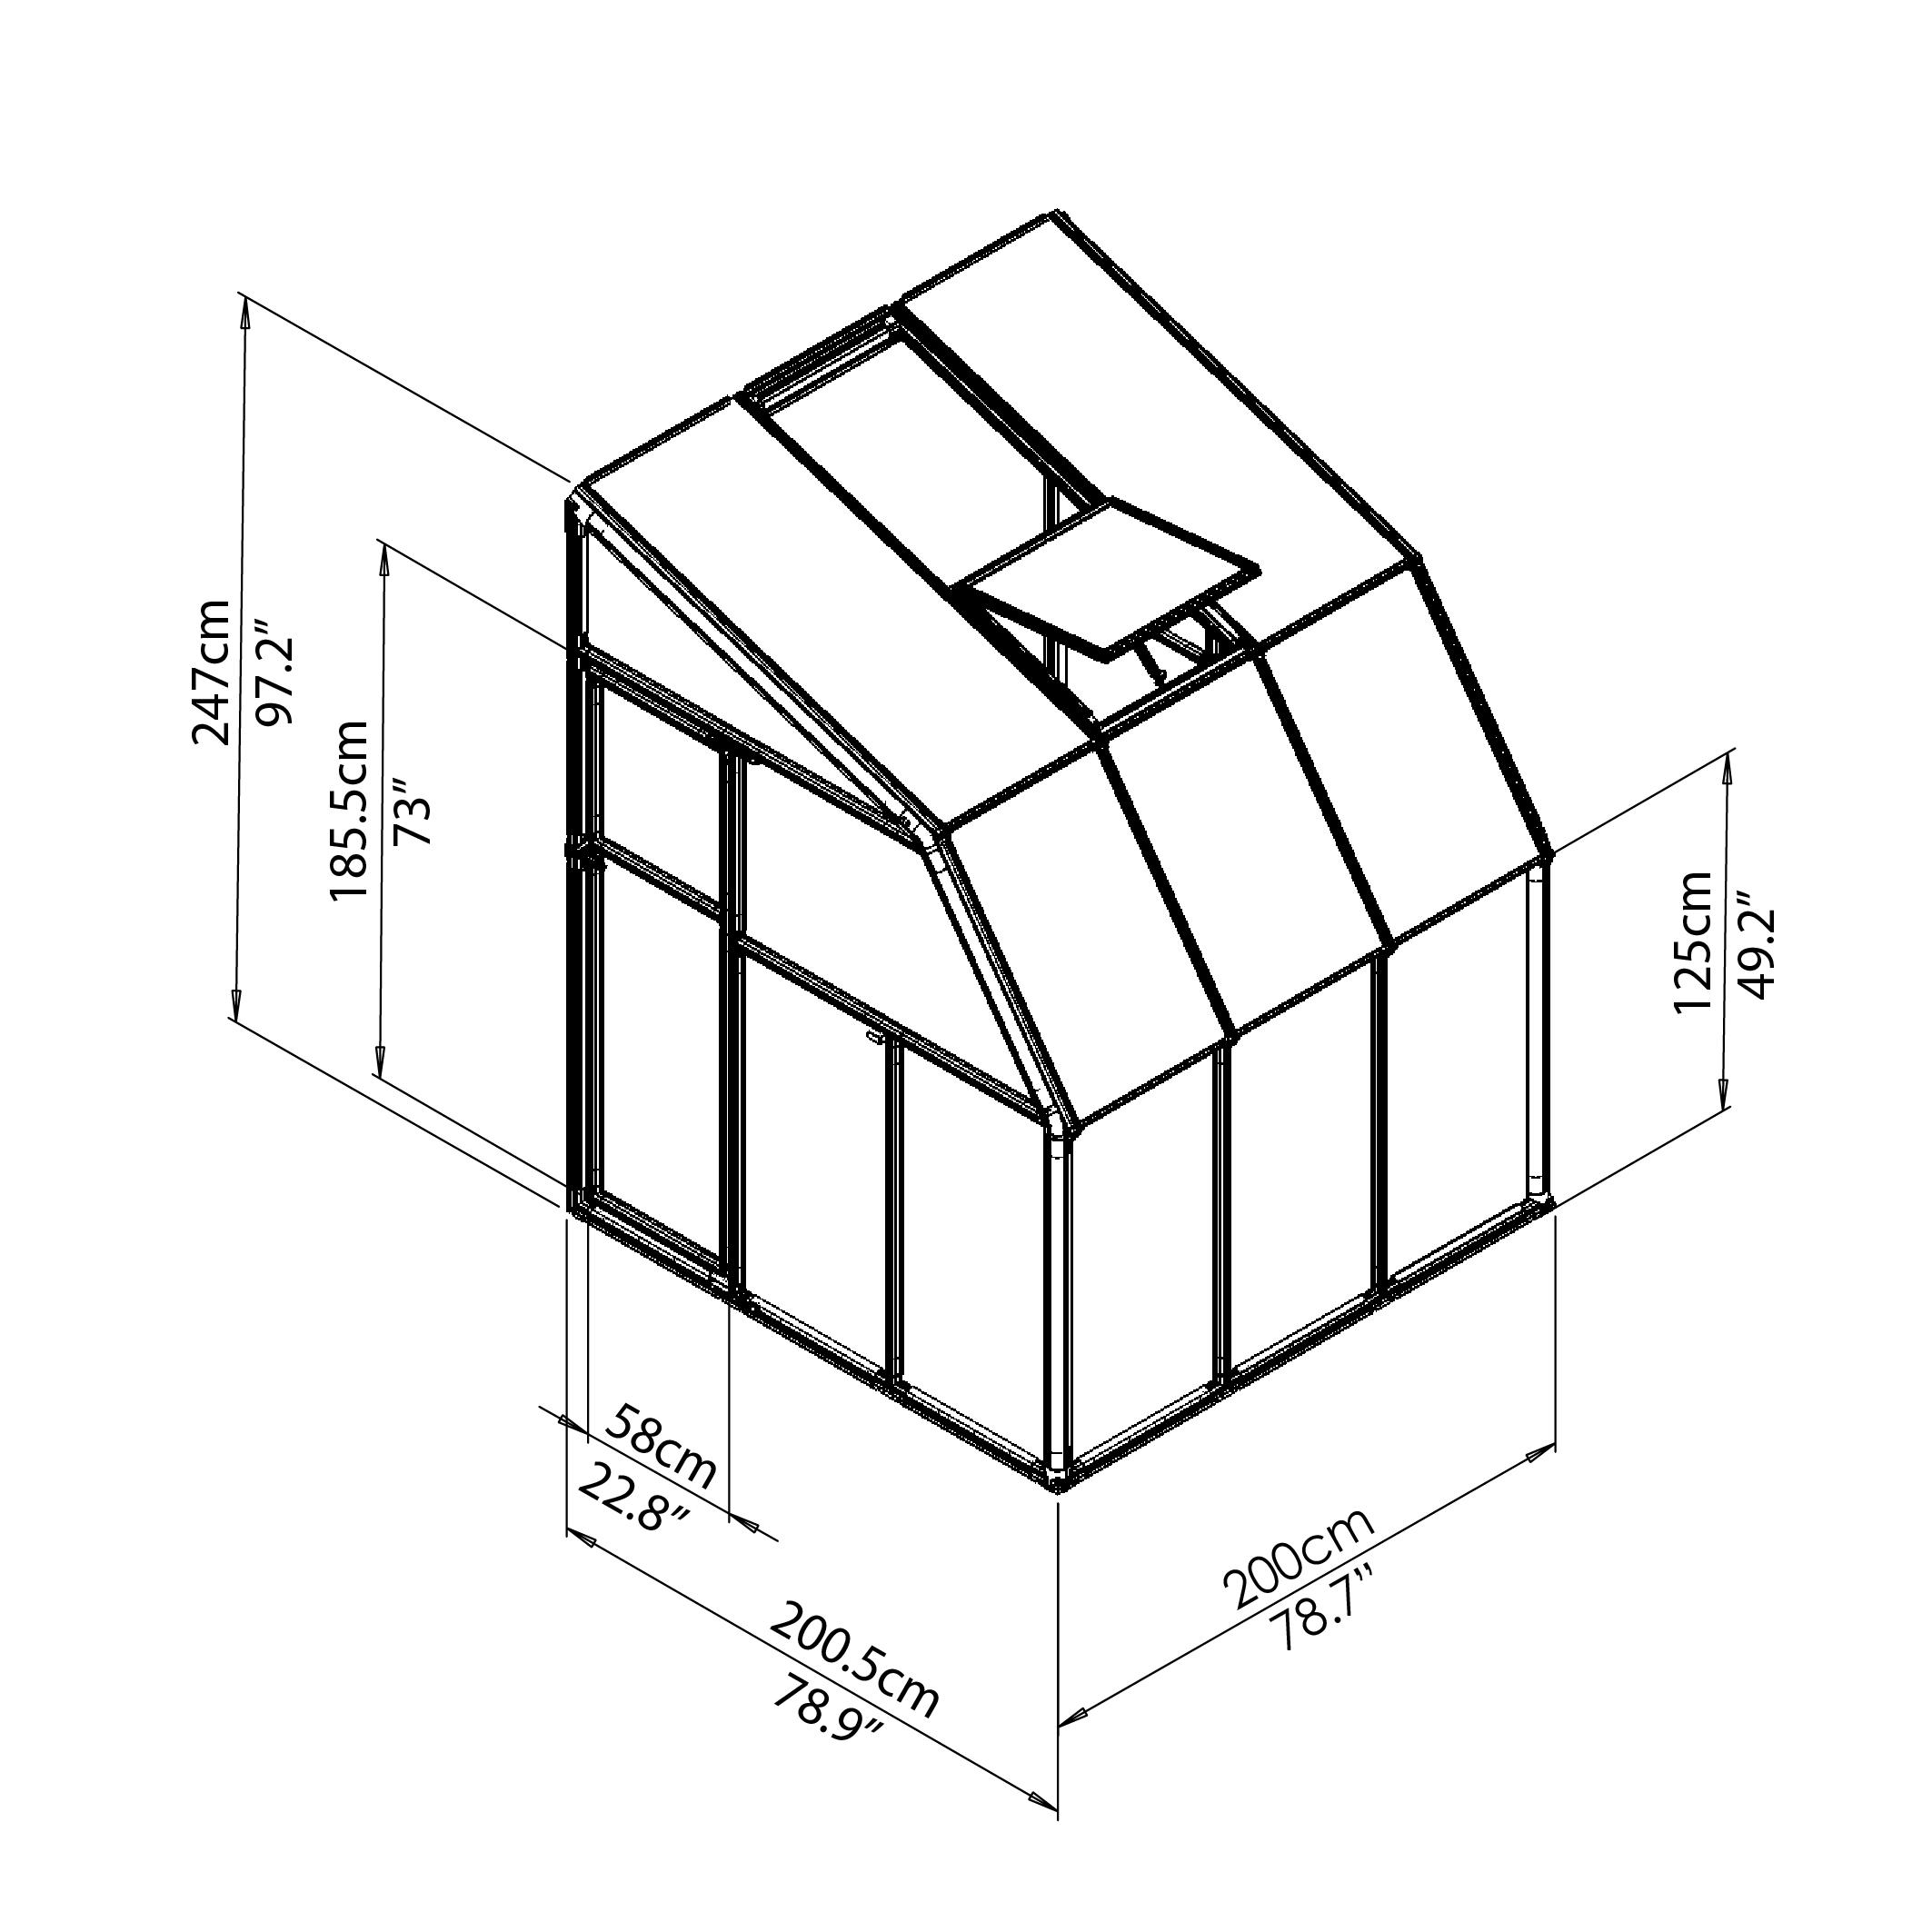 rion-greenhouses-sunroom-6x6-drawing-isoview.jpg